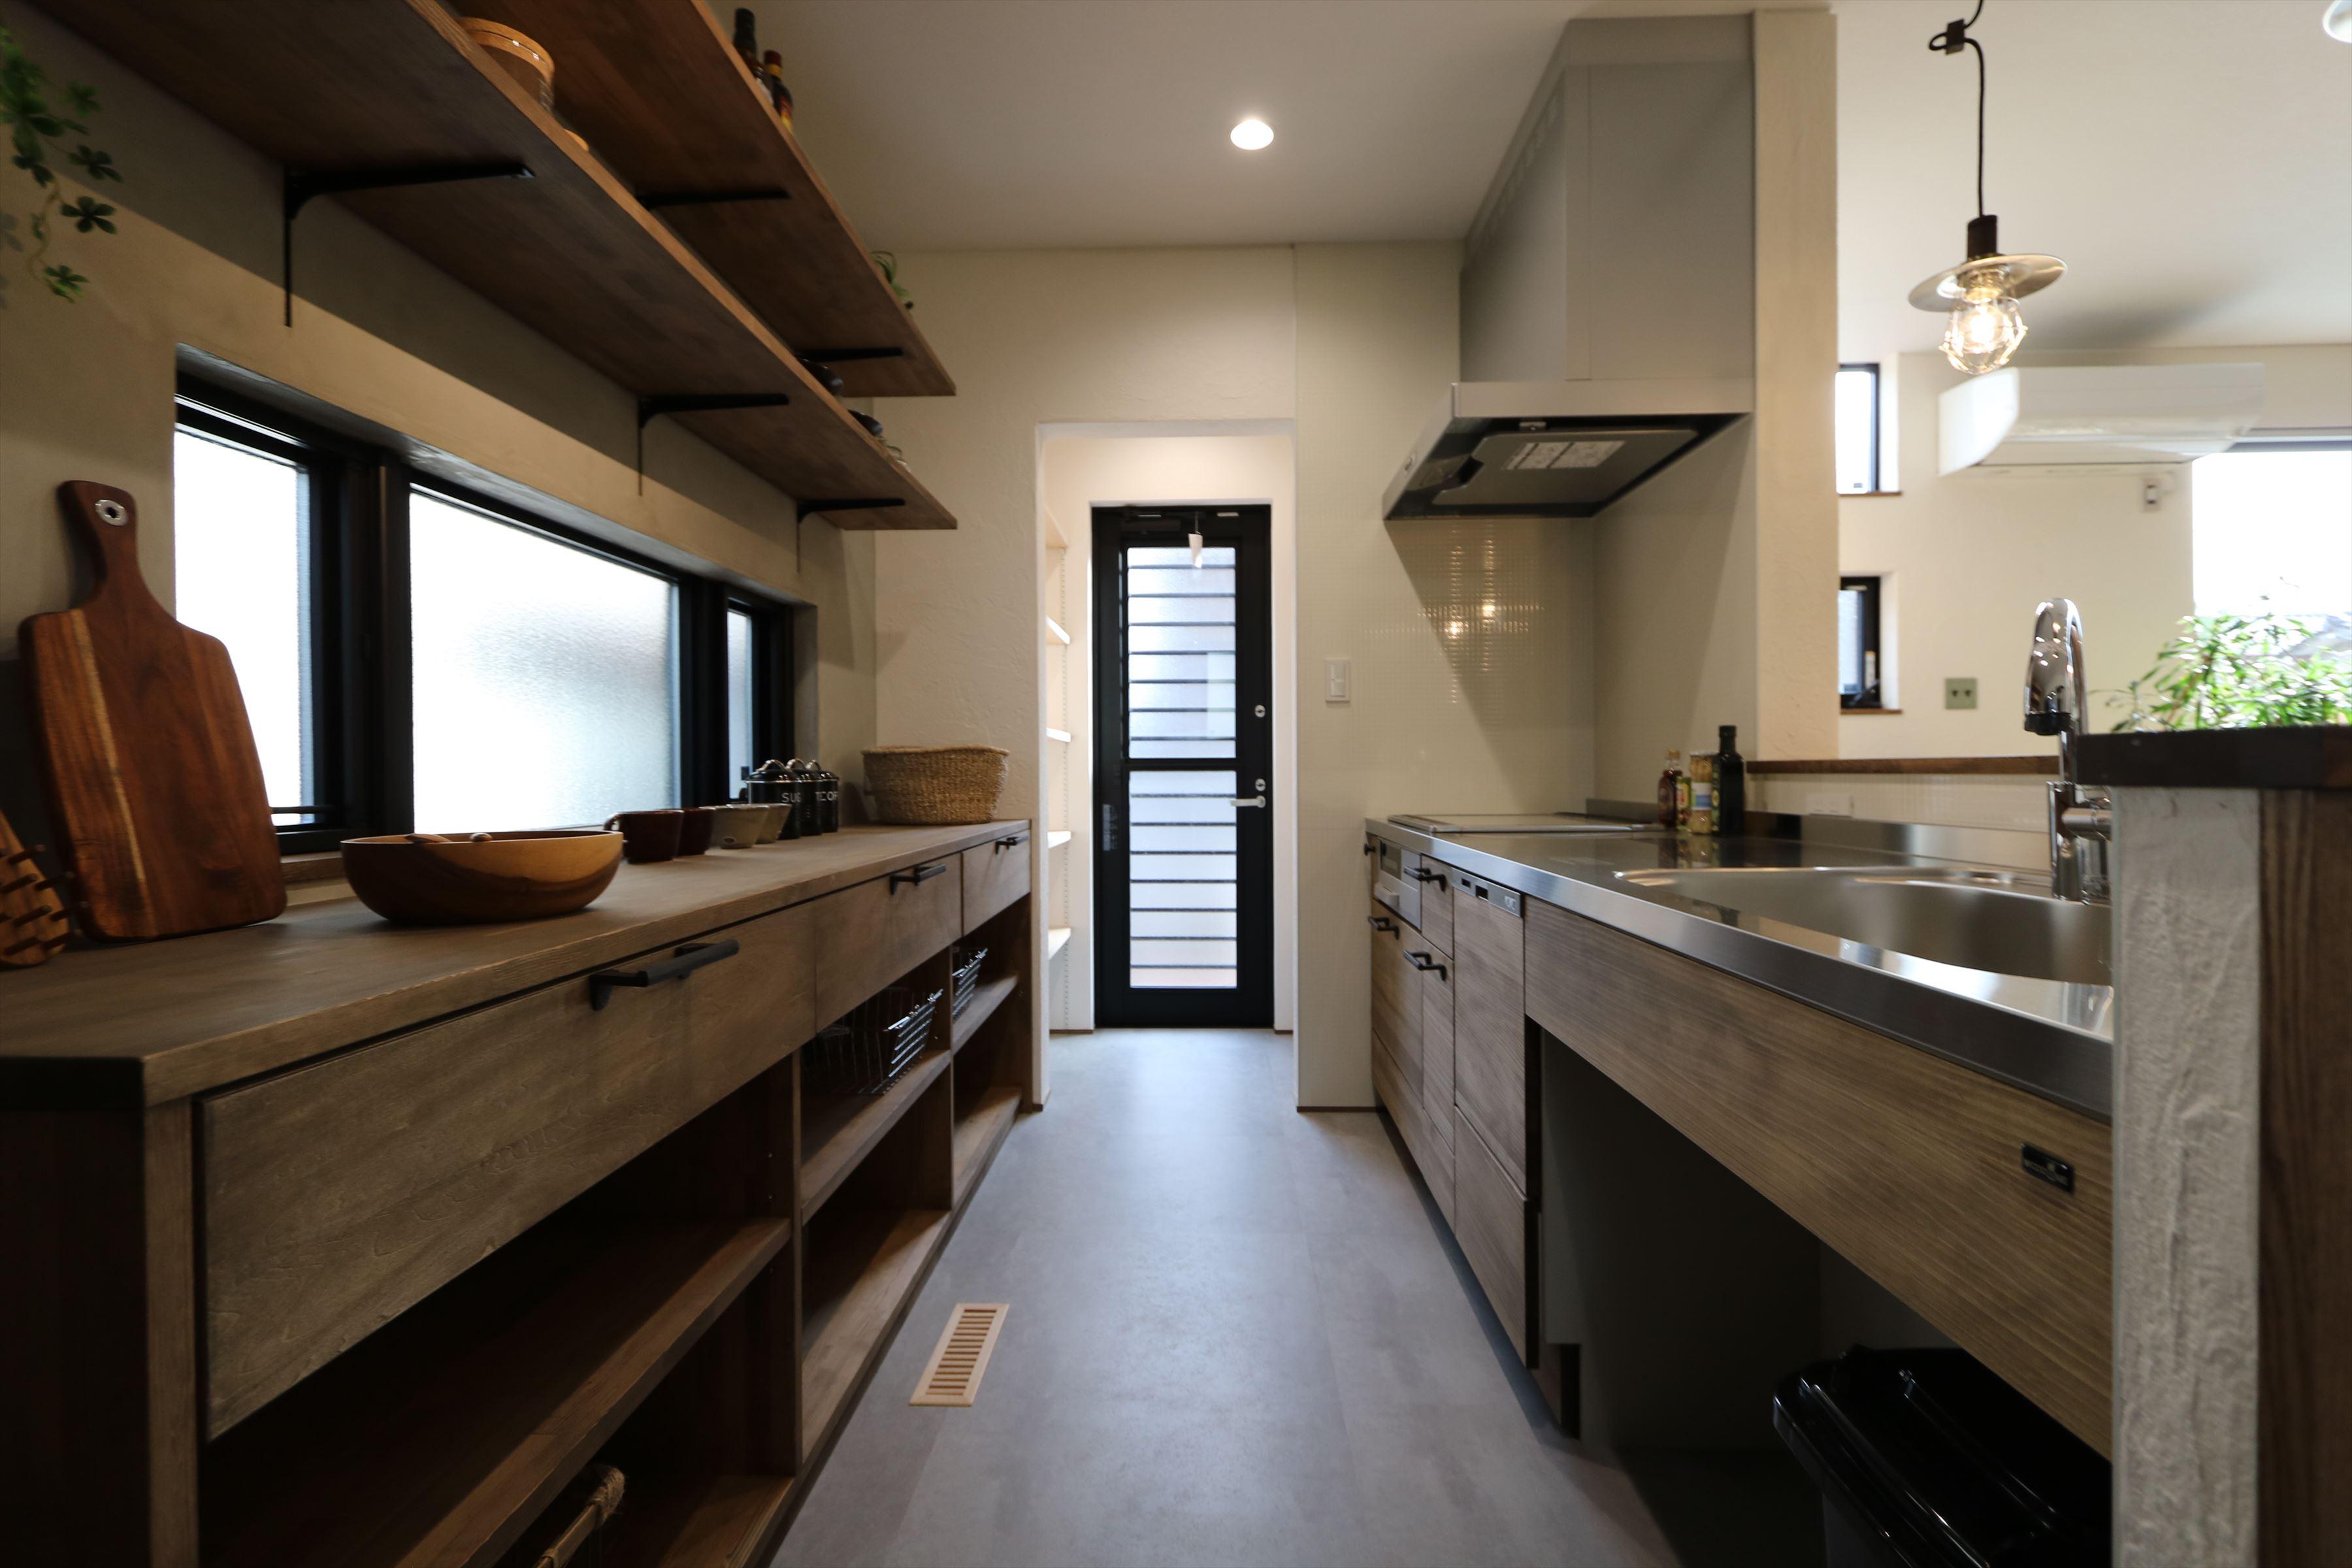 NATURAL MODERN STYLE|石川県金沢市の注文住宅・デザイン性・新築の家・戸建て|E-HOUSE